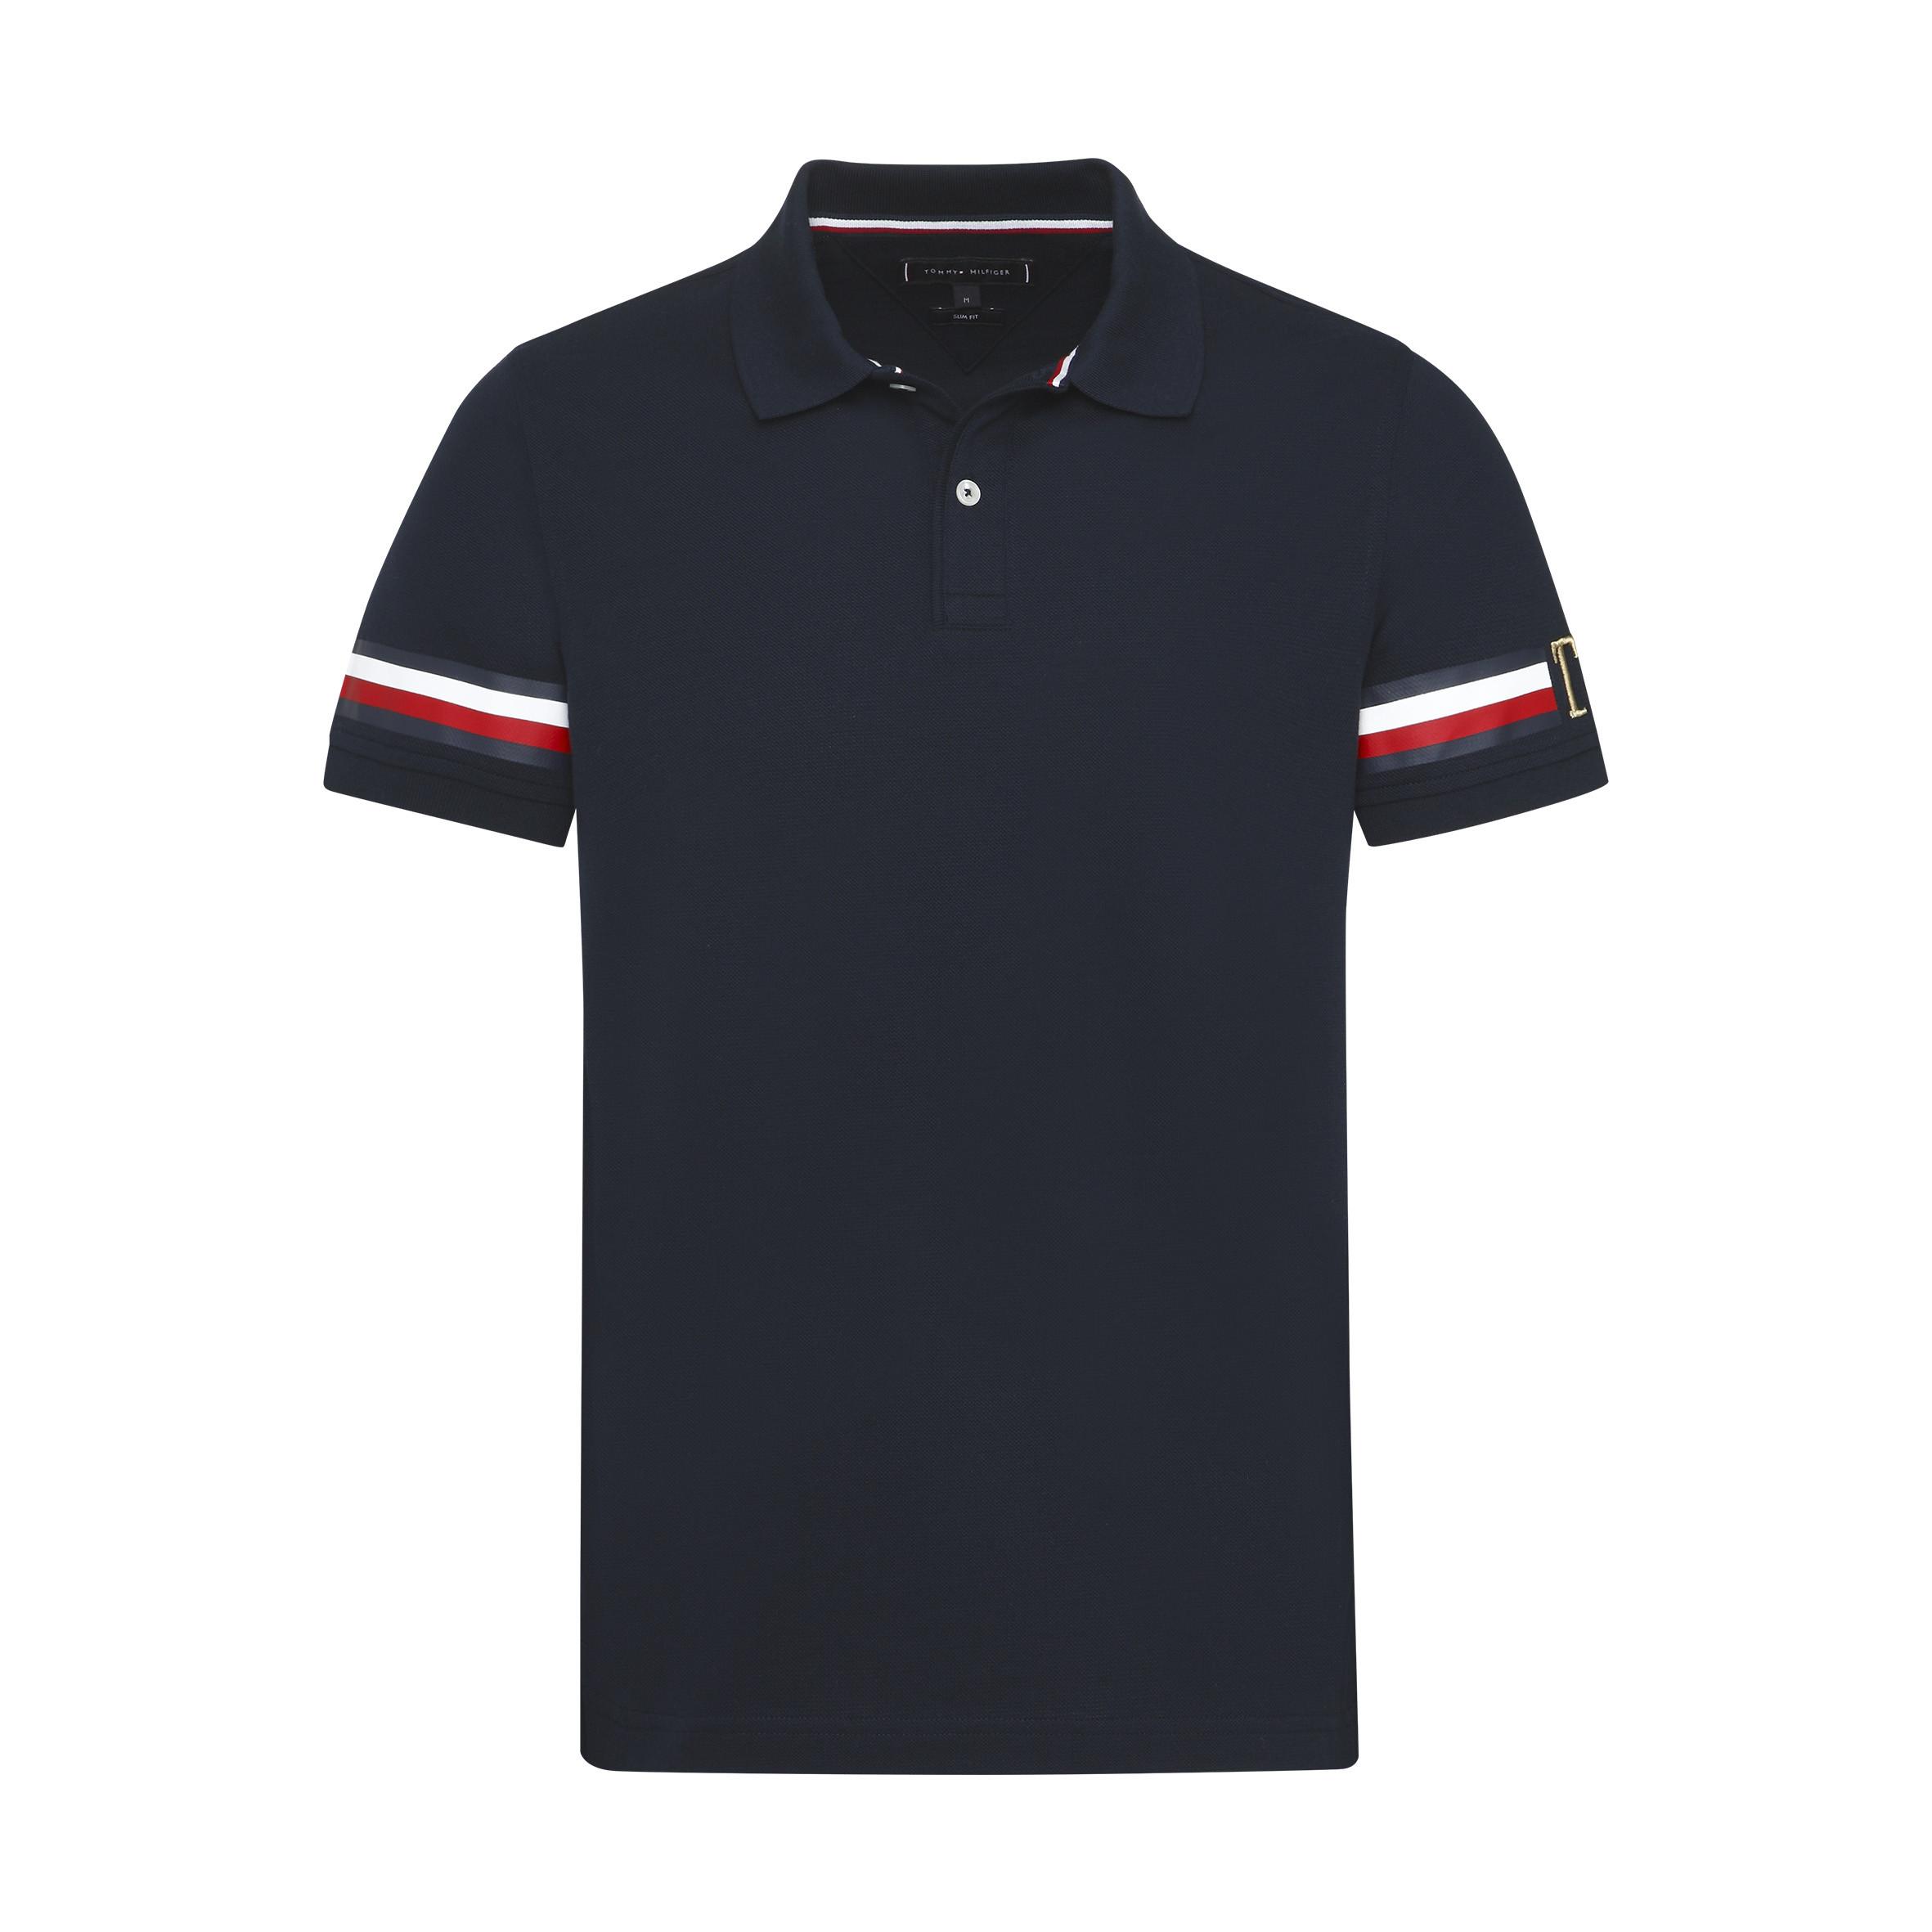 c1c1c2df Icon Sleeve Stripe S - T-skjorter & piqué - Herre